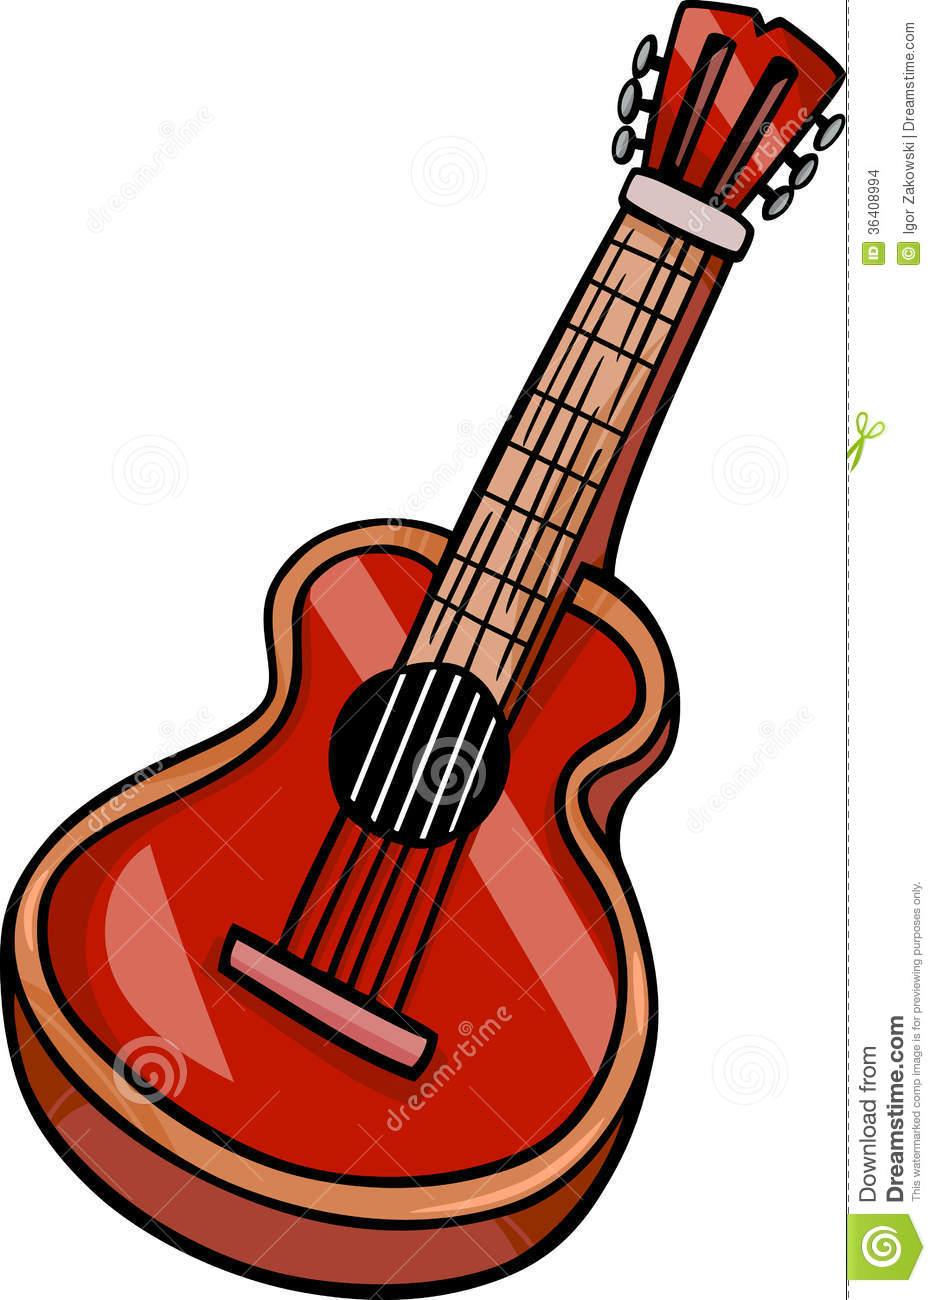 Cartoon Instruments Clipart Cartoon Musical Instruments